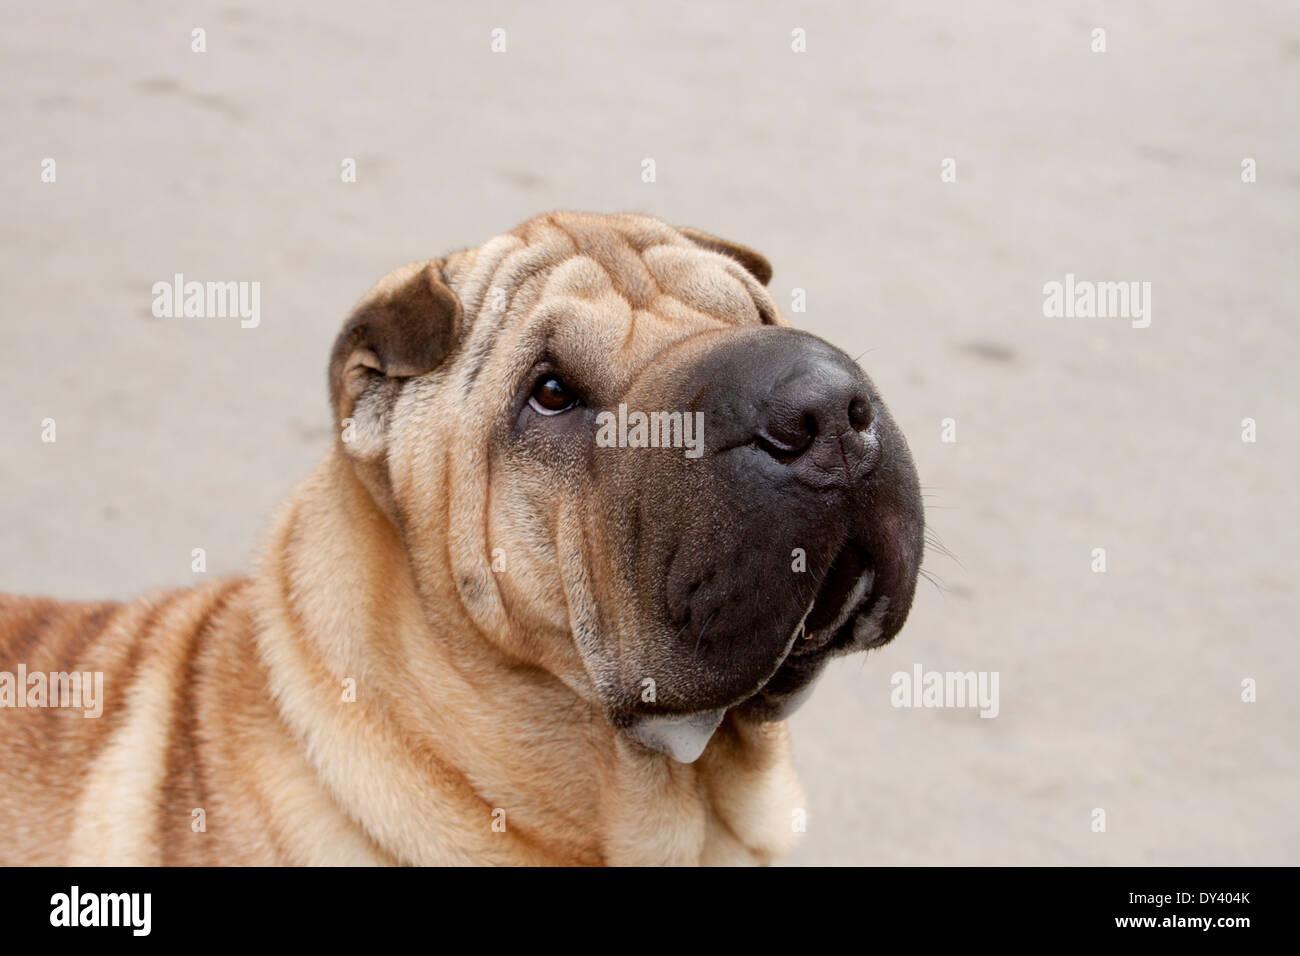 Shar Pei portrait - Stock Image